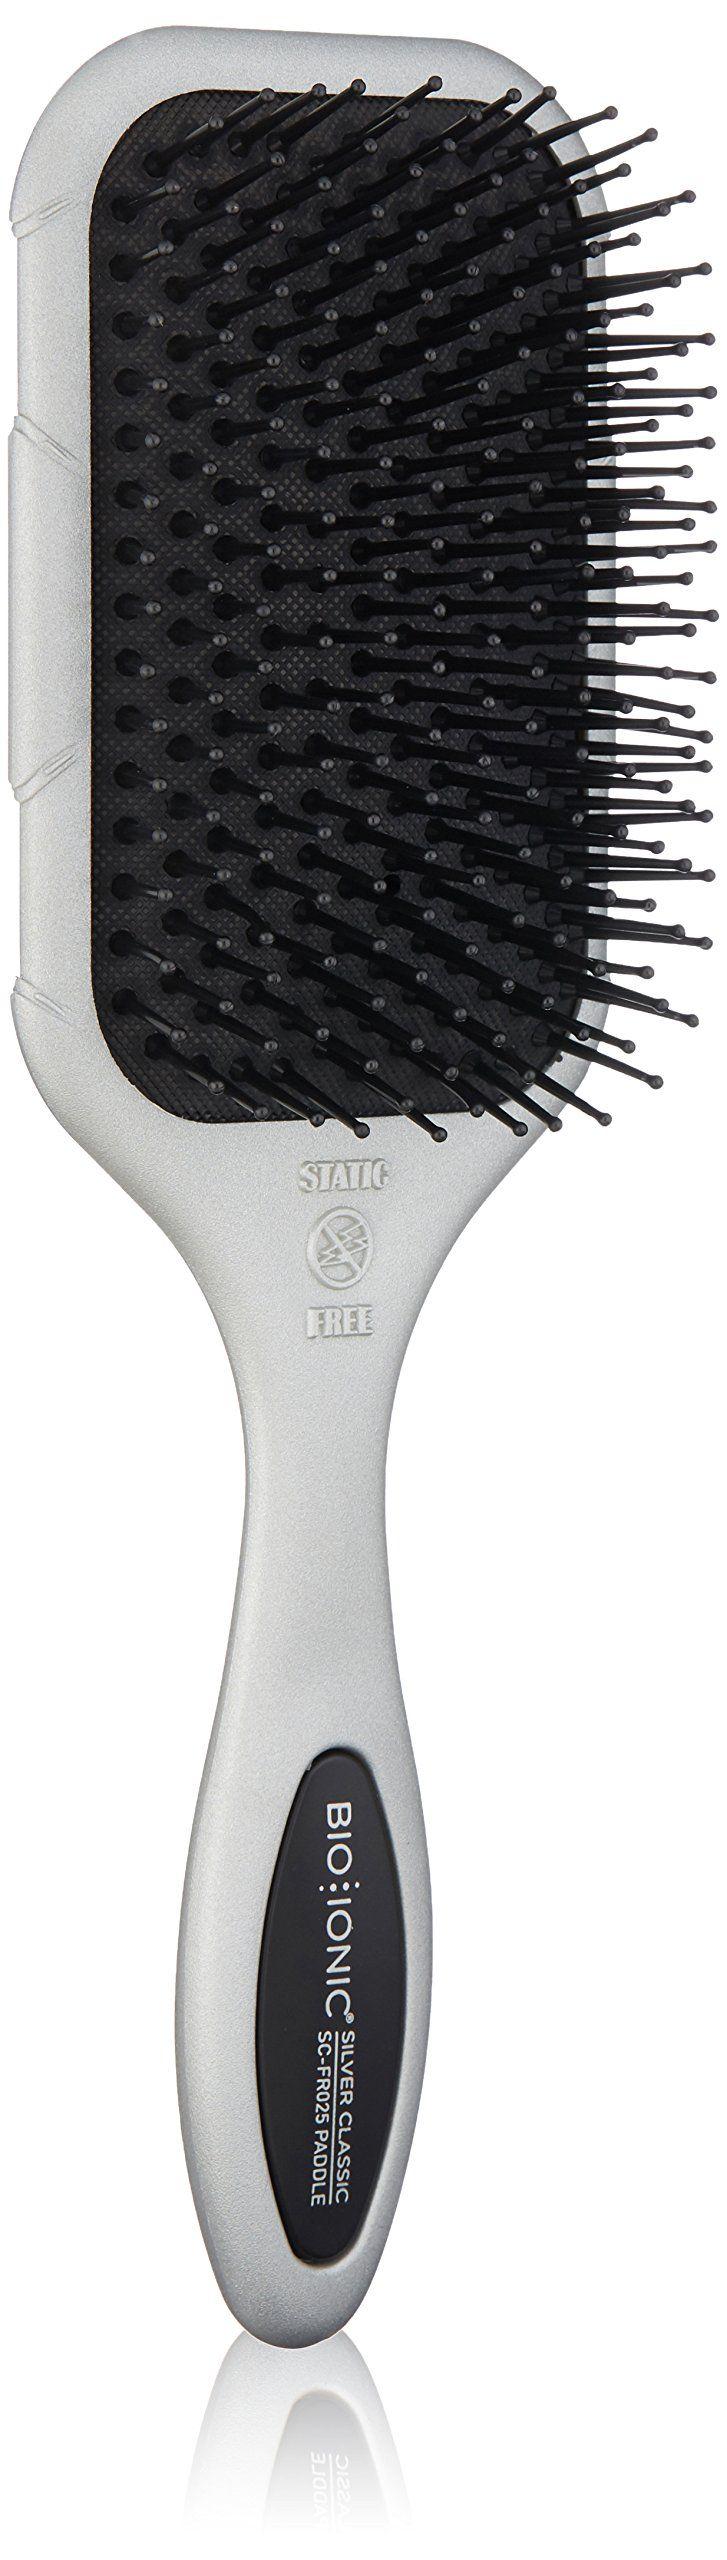 BIO IONIC Silver Classic Nanoionic Conditioning Brush, Paddle